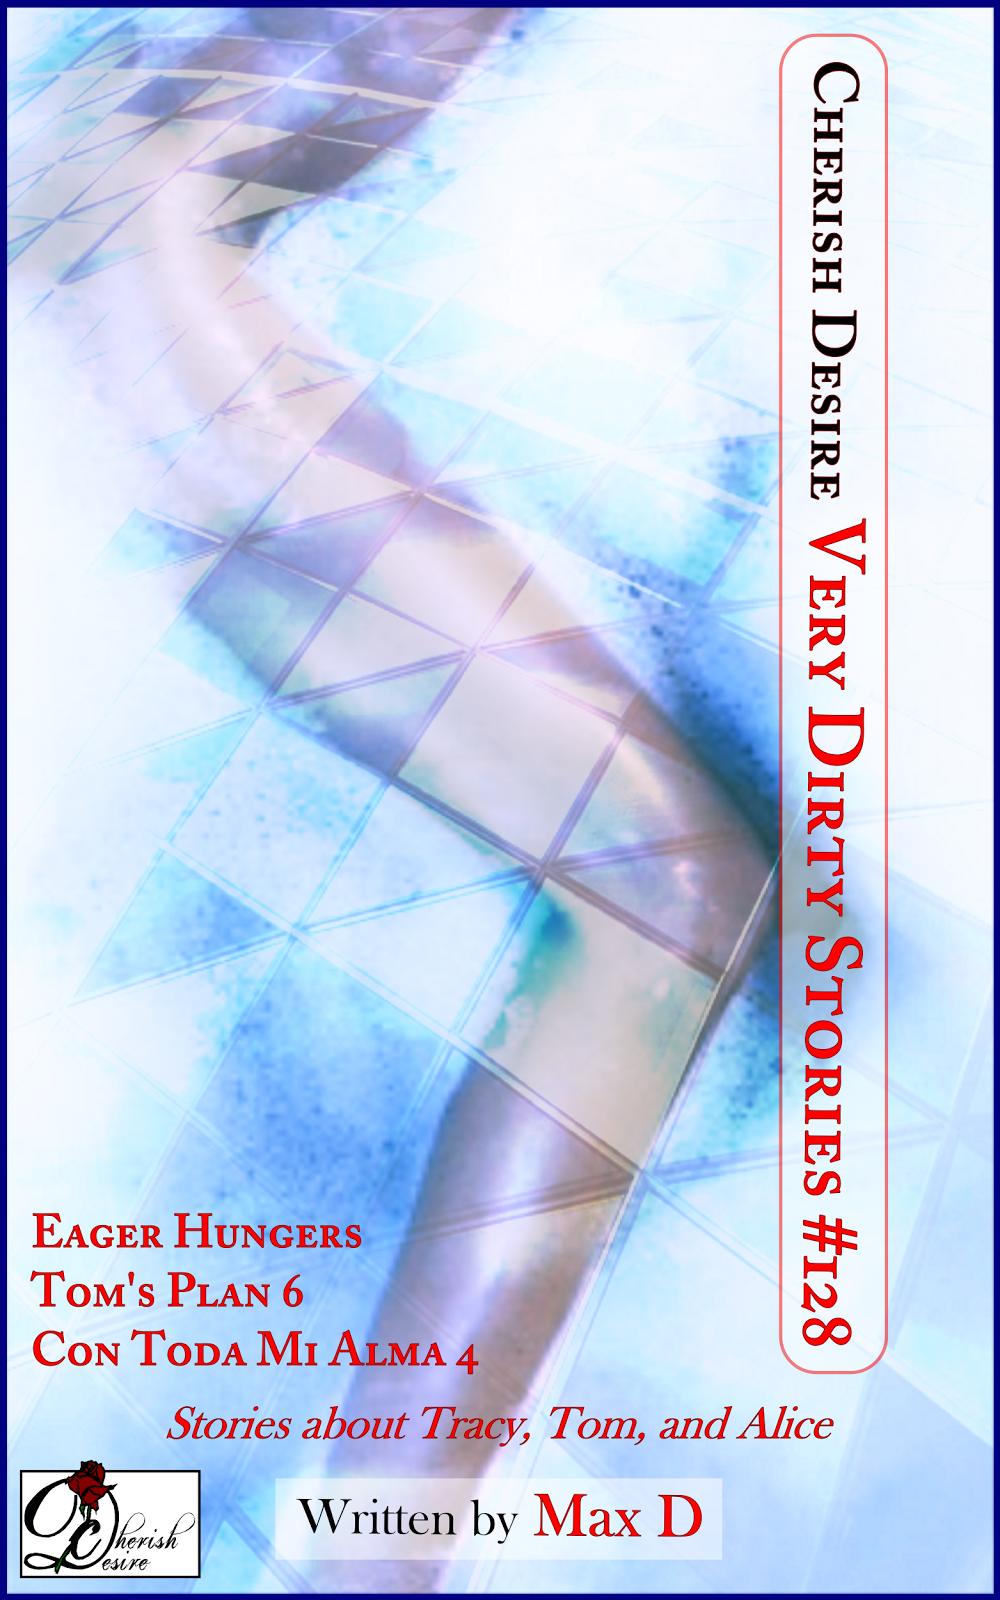 Cherish Desire: Very Dirty Stories #128, Max D, erotica